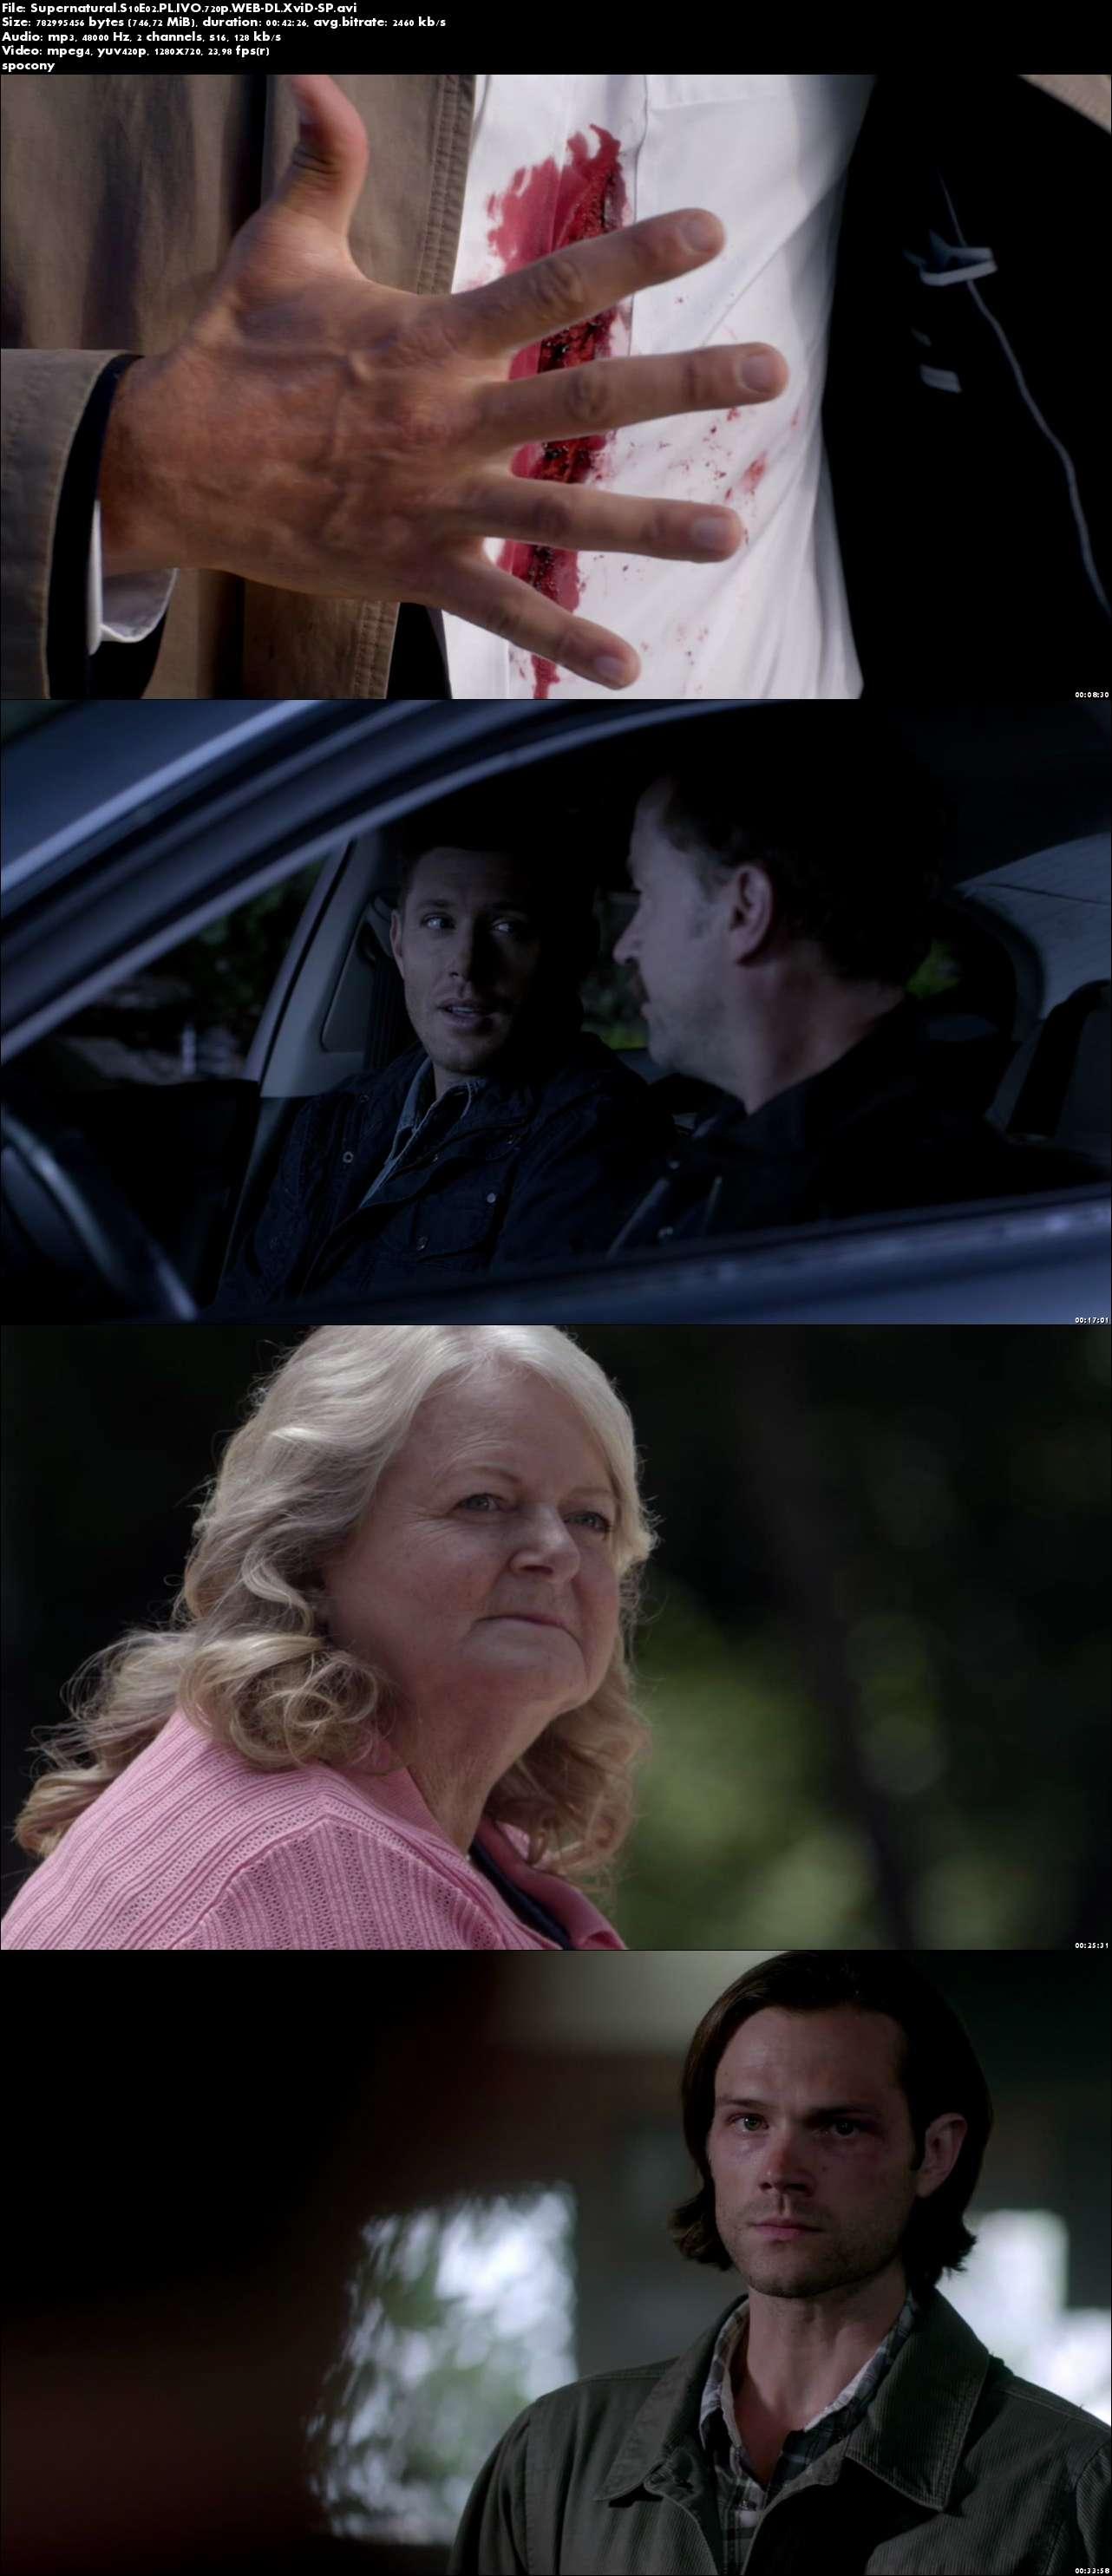 Nie z tego świata / Supernatural (2014) {Sezon 10} (Pełen sezon) PL.IVO.720p.WEB-DL.XviD-SP [Lektor PL-IVO]